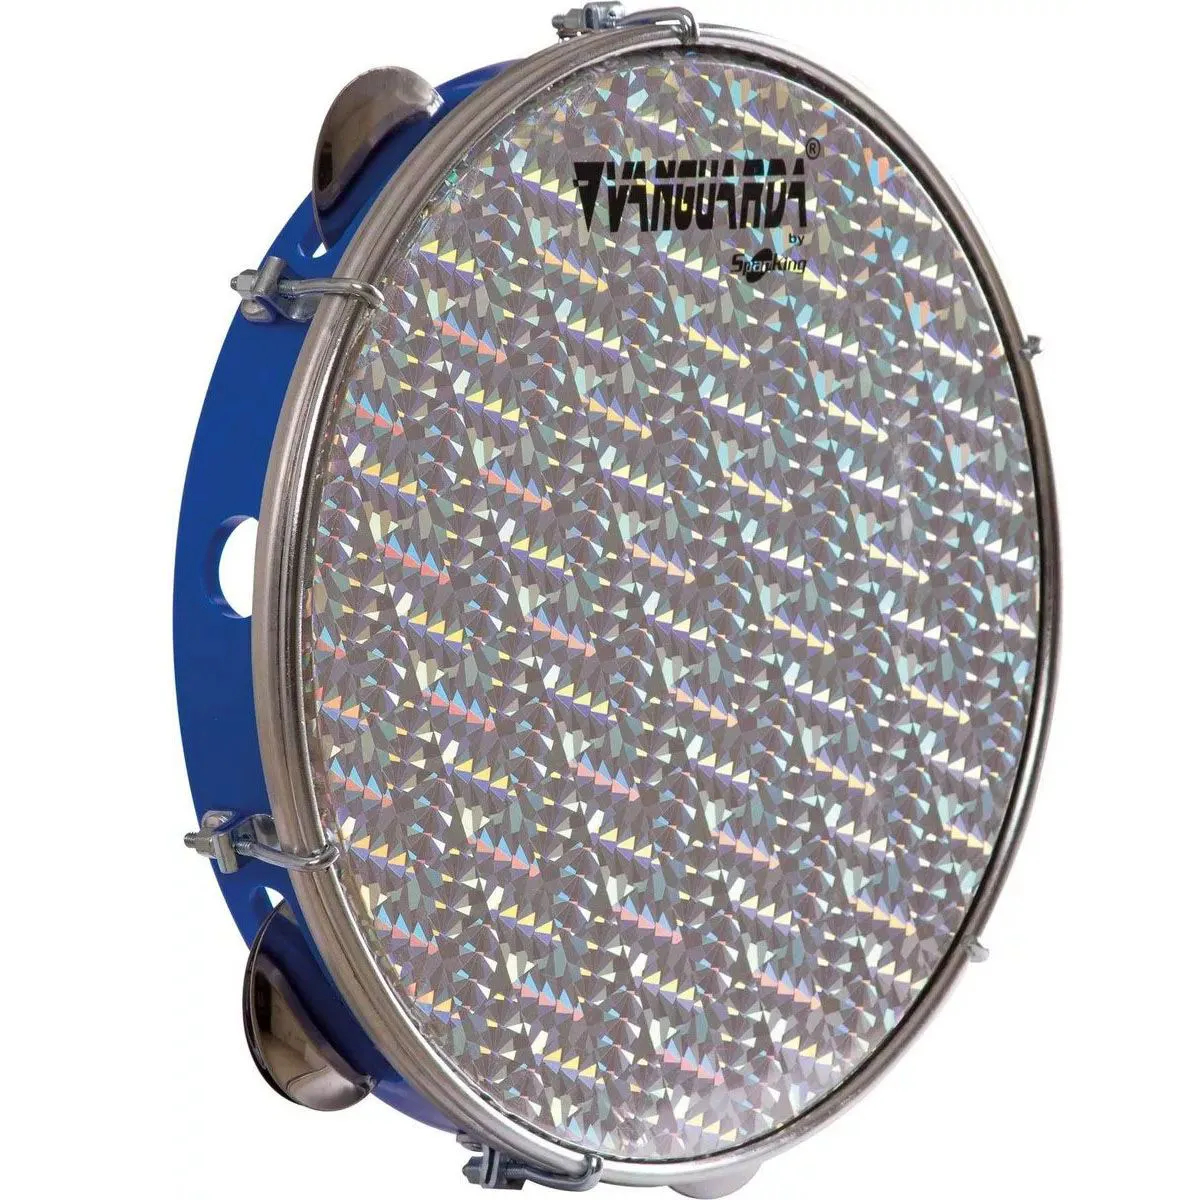 Pandeiro Spanking 10 Aro ABS Azul Pele Holográfica Prata